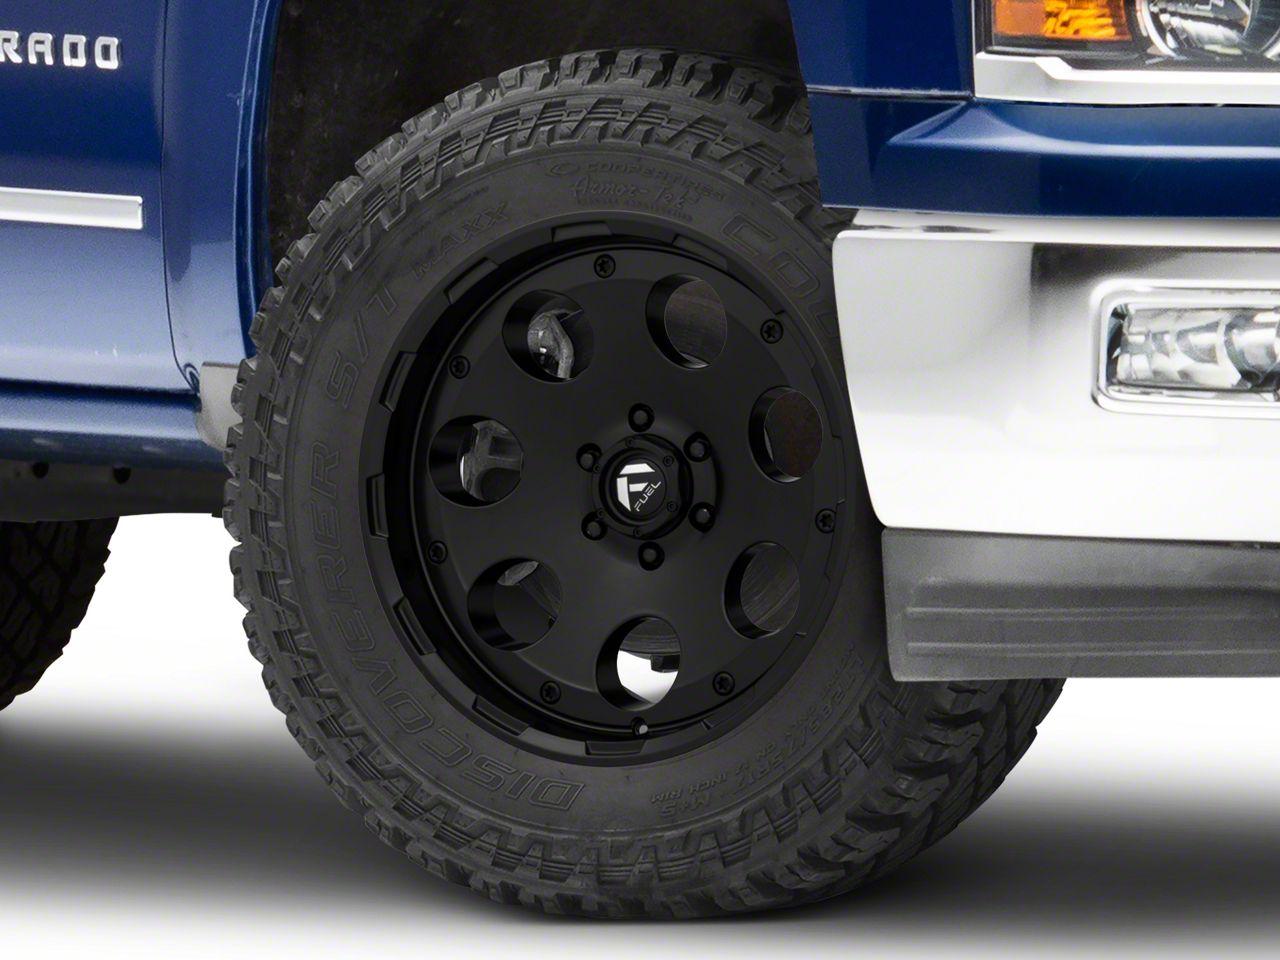 Fuel Wheels Enduro Matte Black 6-Lug Wheel - 20x9 (99-18 Silverado 1500)